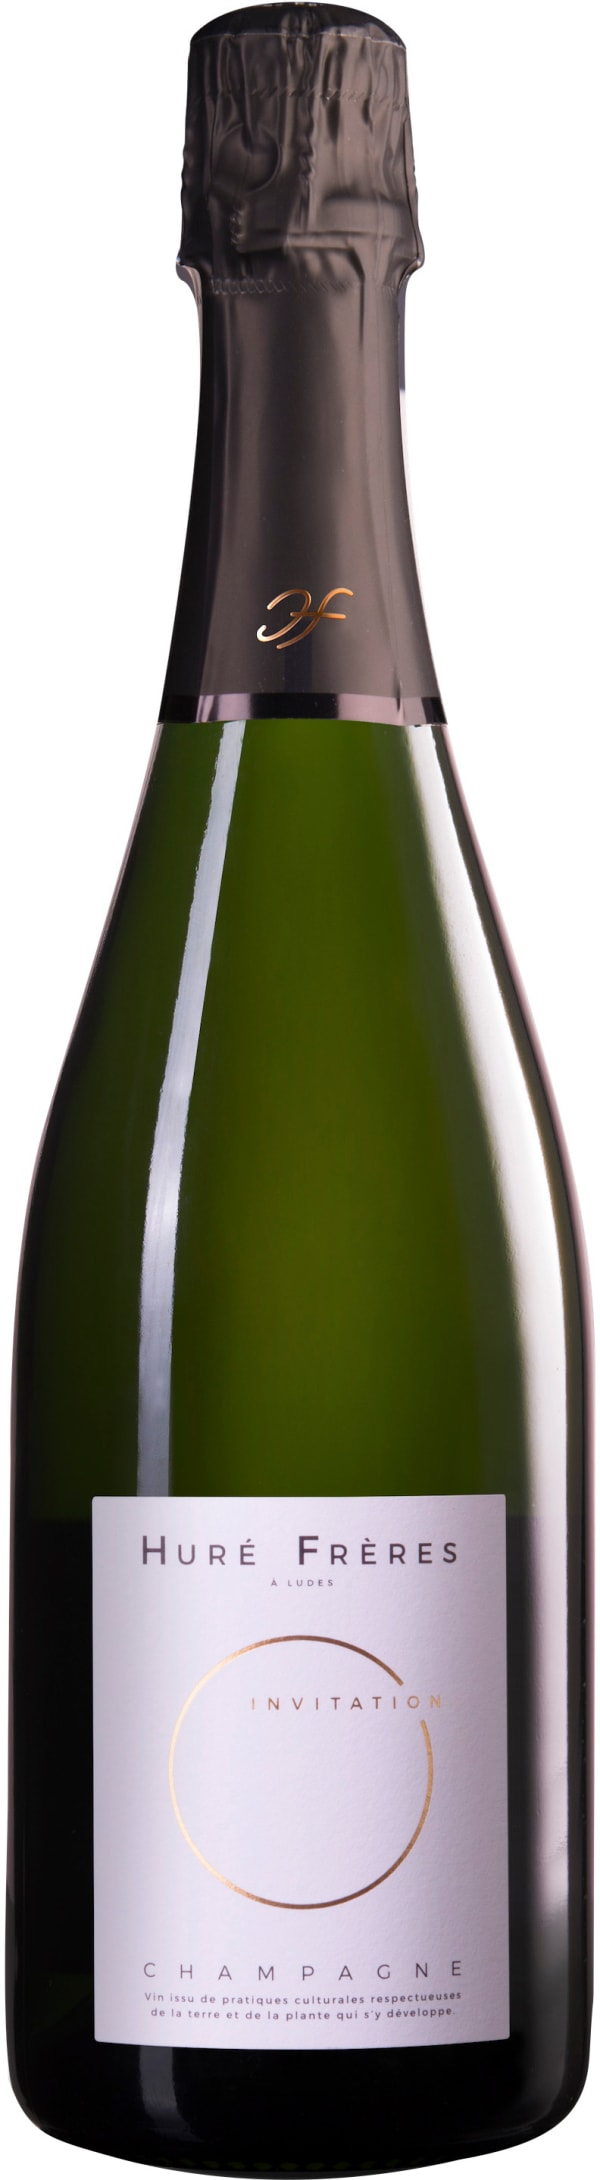 Huré Frères Invitation Champagne Brut